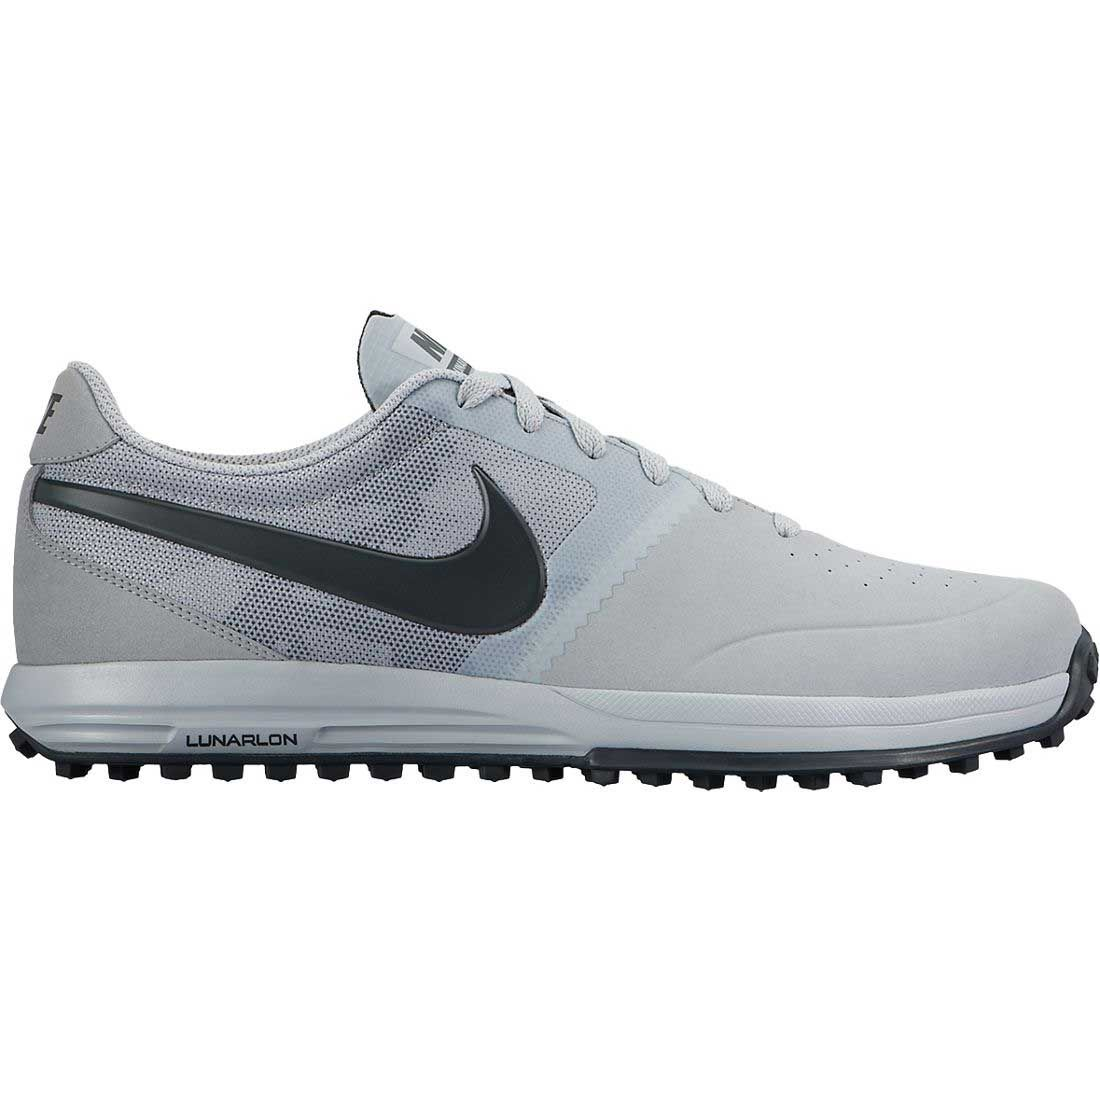 Prima Contribuyente Mejor  Buy Nike Lunar Mont Royal Golf Shoes Wolf Grey   Golf Discount